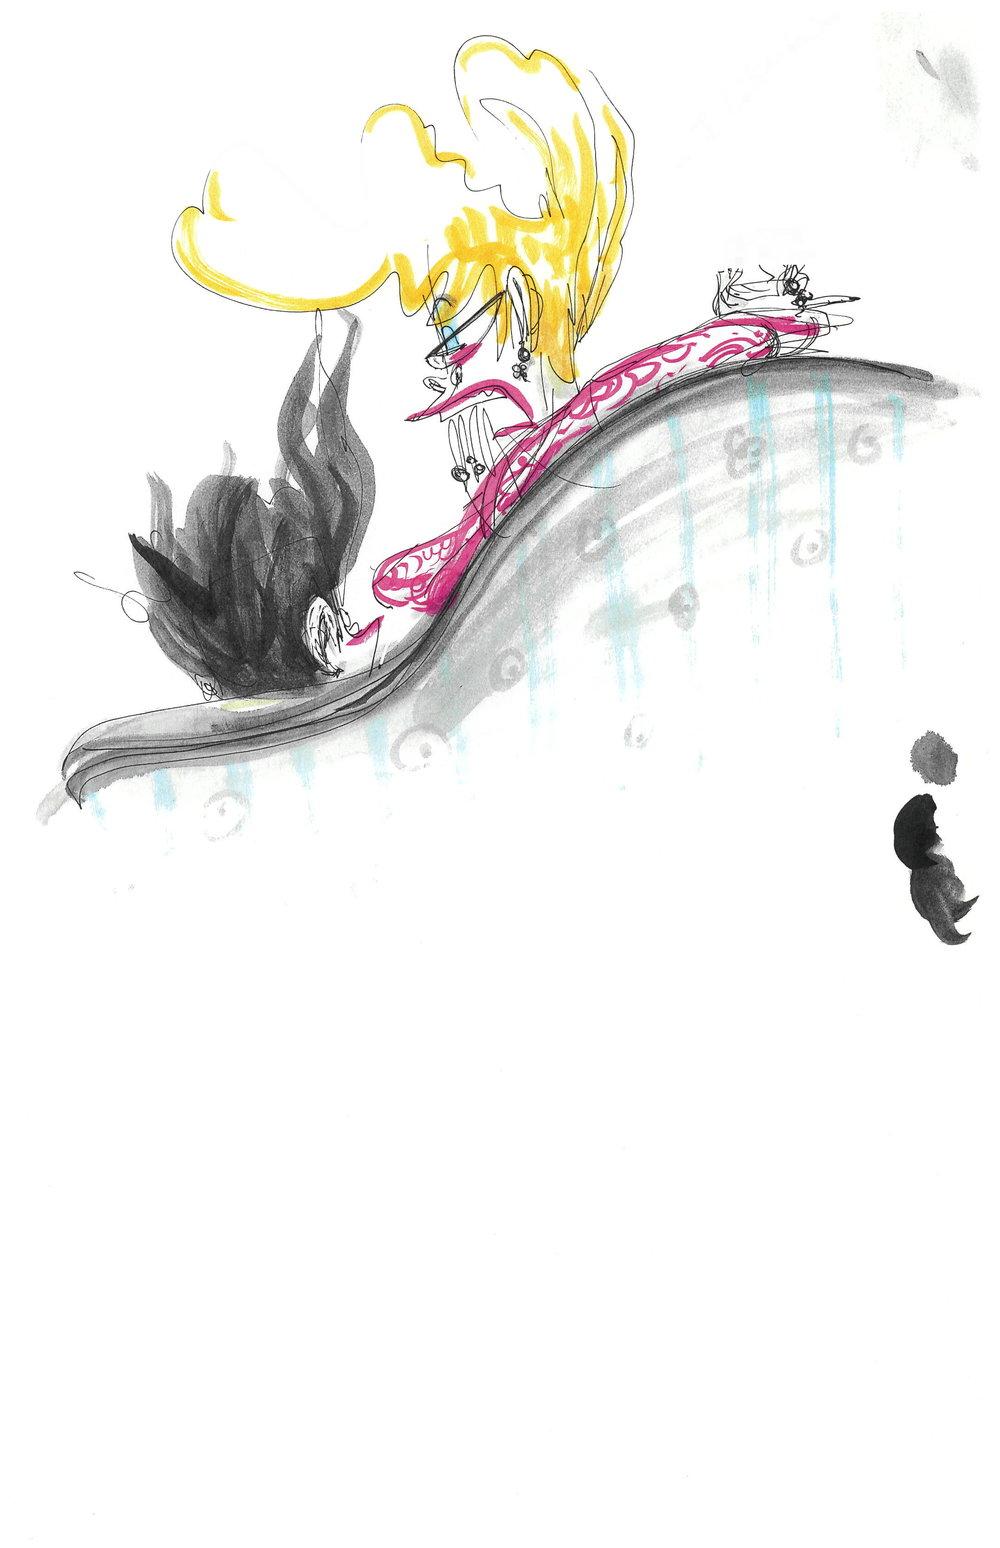 BRIANWONDERS-sketches-1_Page_06_Image_0001.jpg